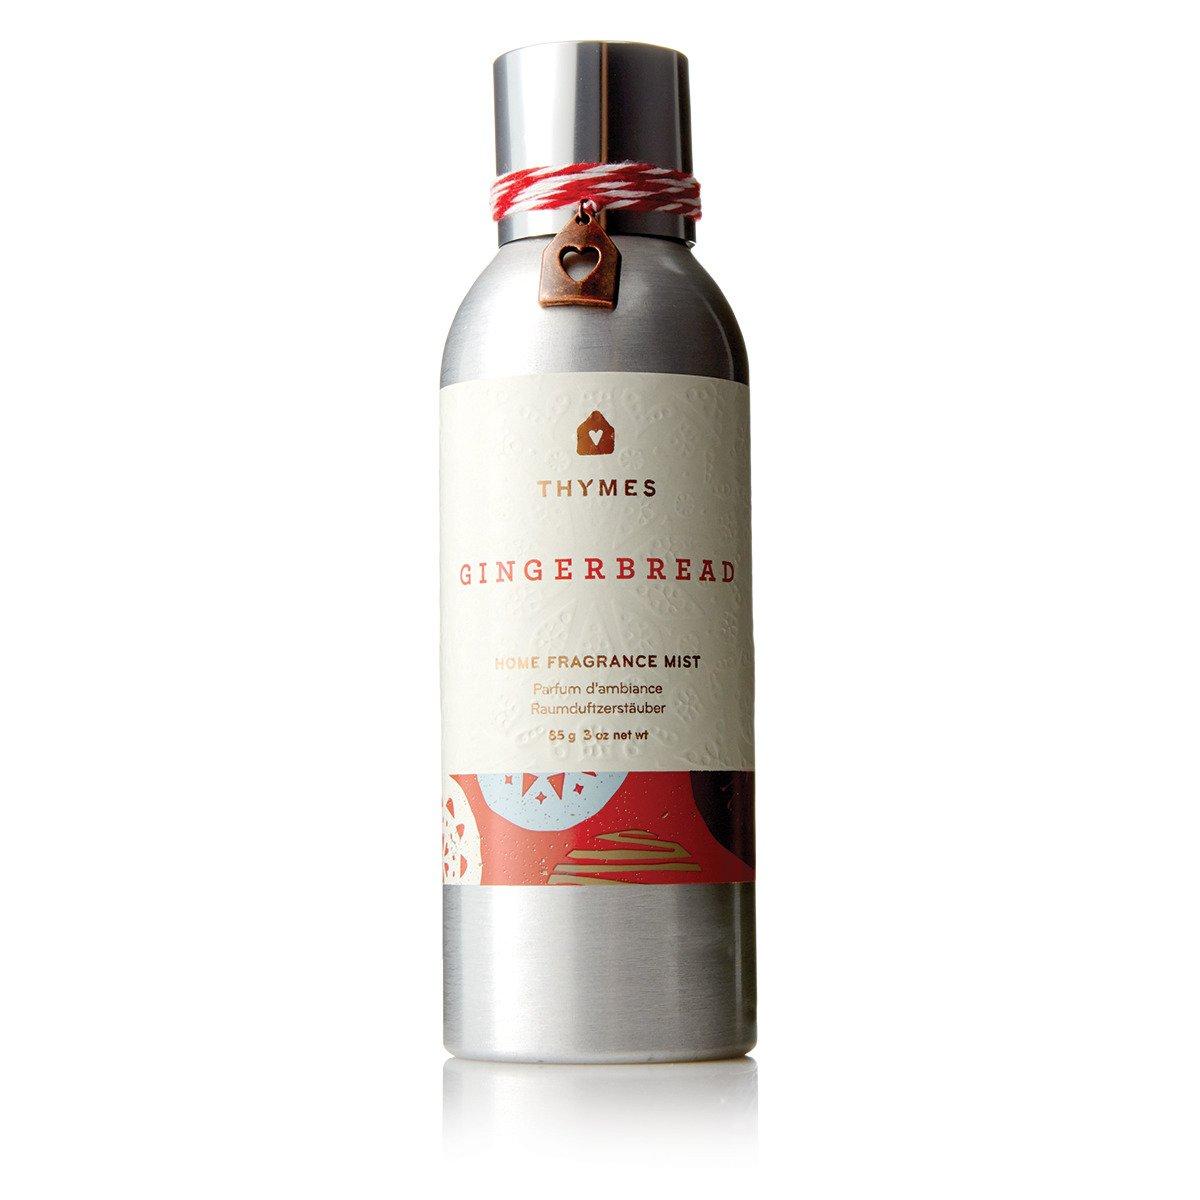 Thymes 0550560100 – Warm Gingerbread Fragrance Mist – 3 Ounces